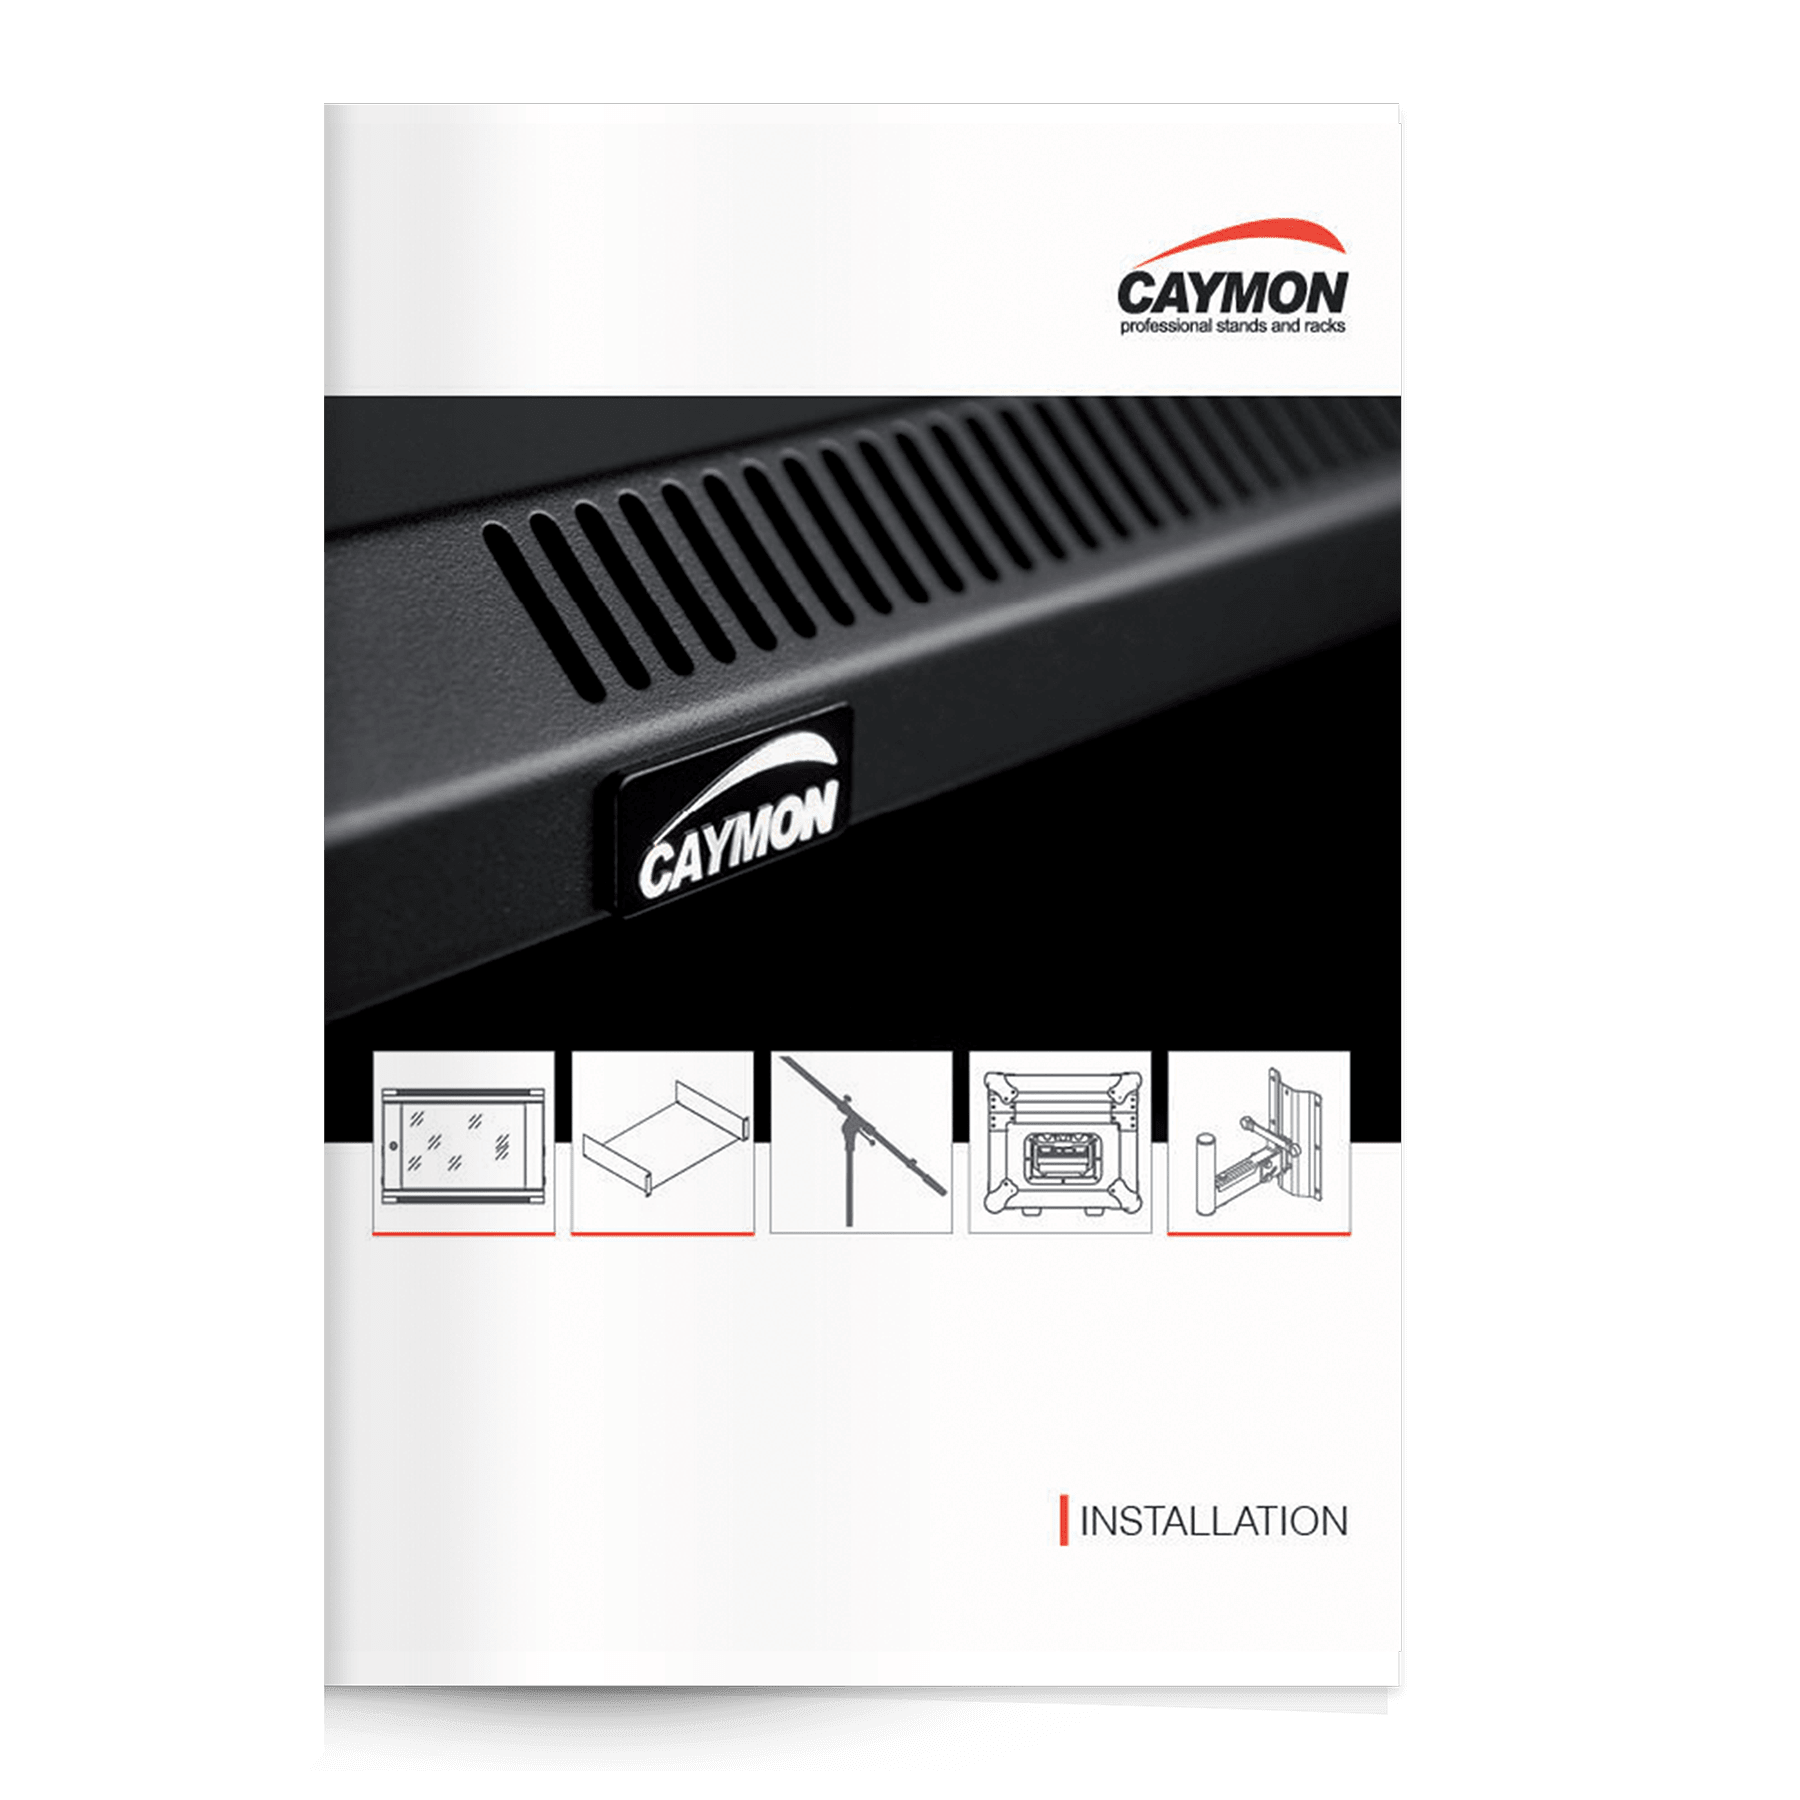 PROMO4071 - CAYMON installation folder 2.0